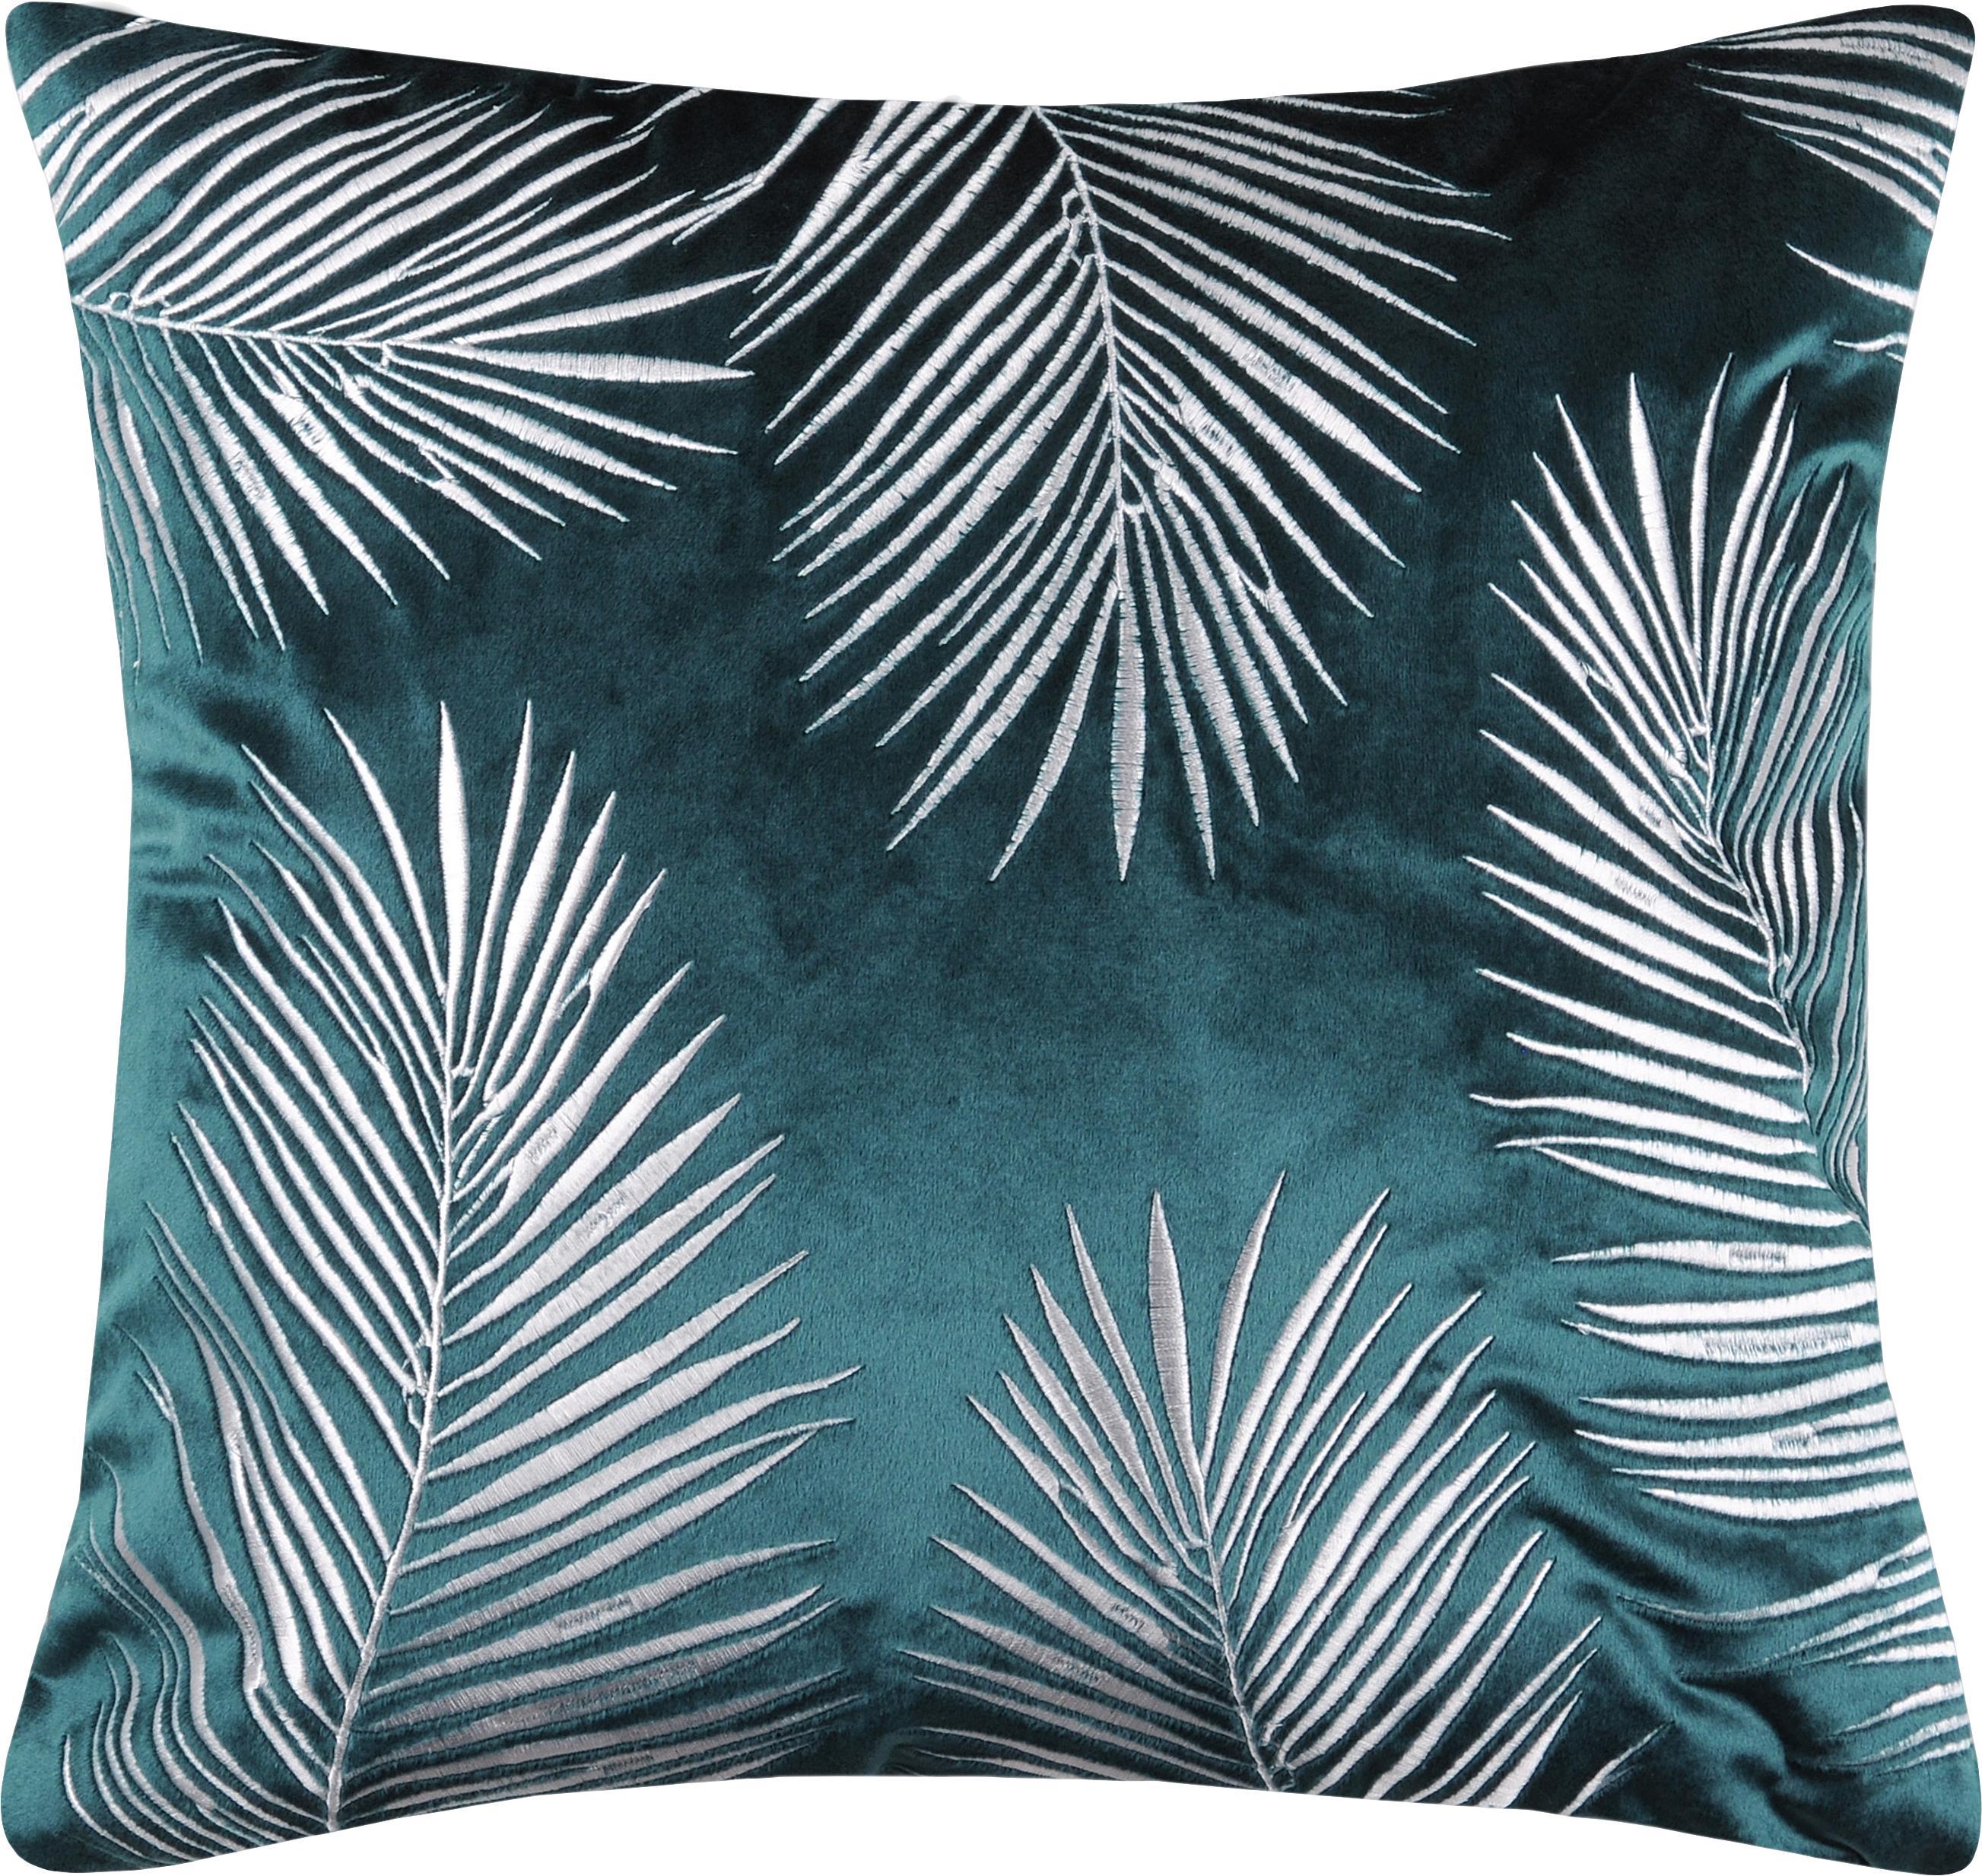 Samt-Kissenhülle Ibarra mit Palmenblatt Stickerei, 100% Polyester, Petrolblau, Weiß, 45 x 45 cm